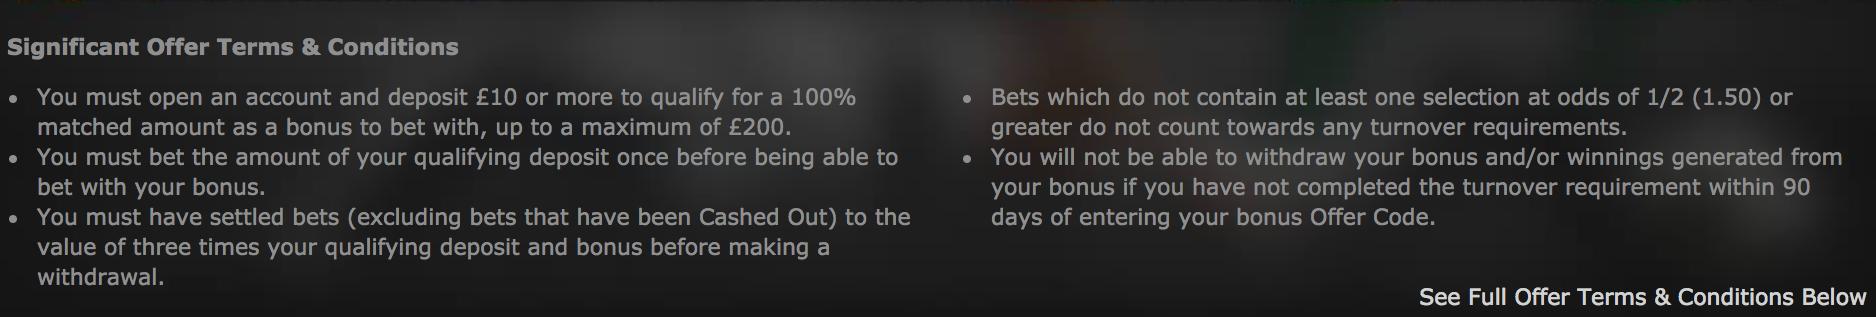 Monkey betting terms dime dfa mod $5 binary options